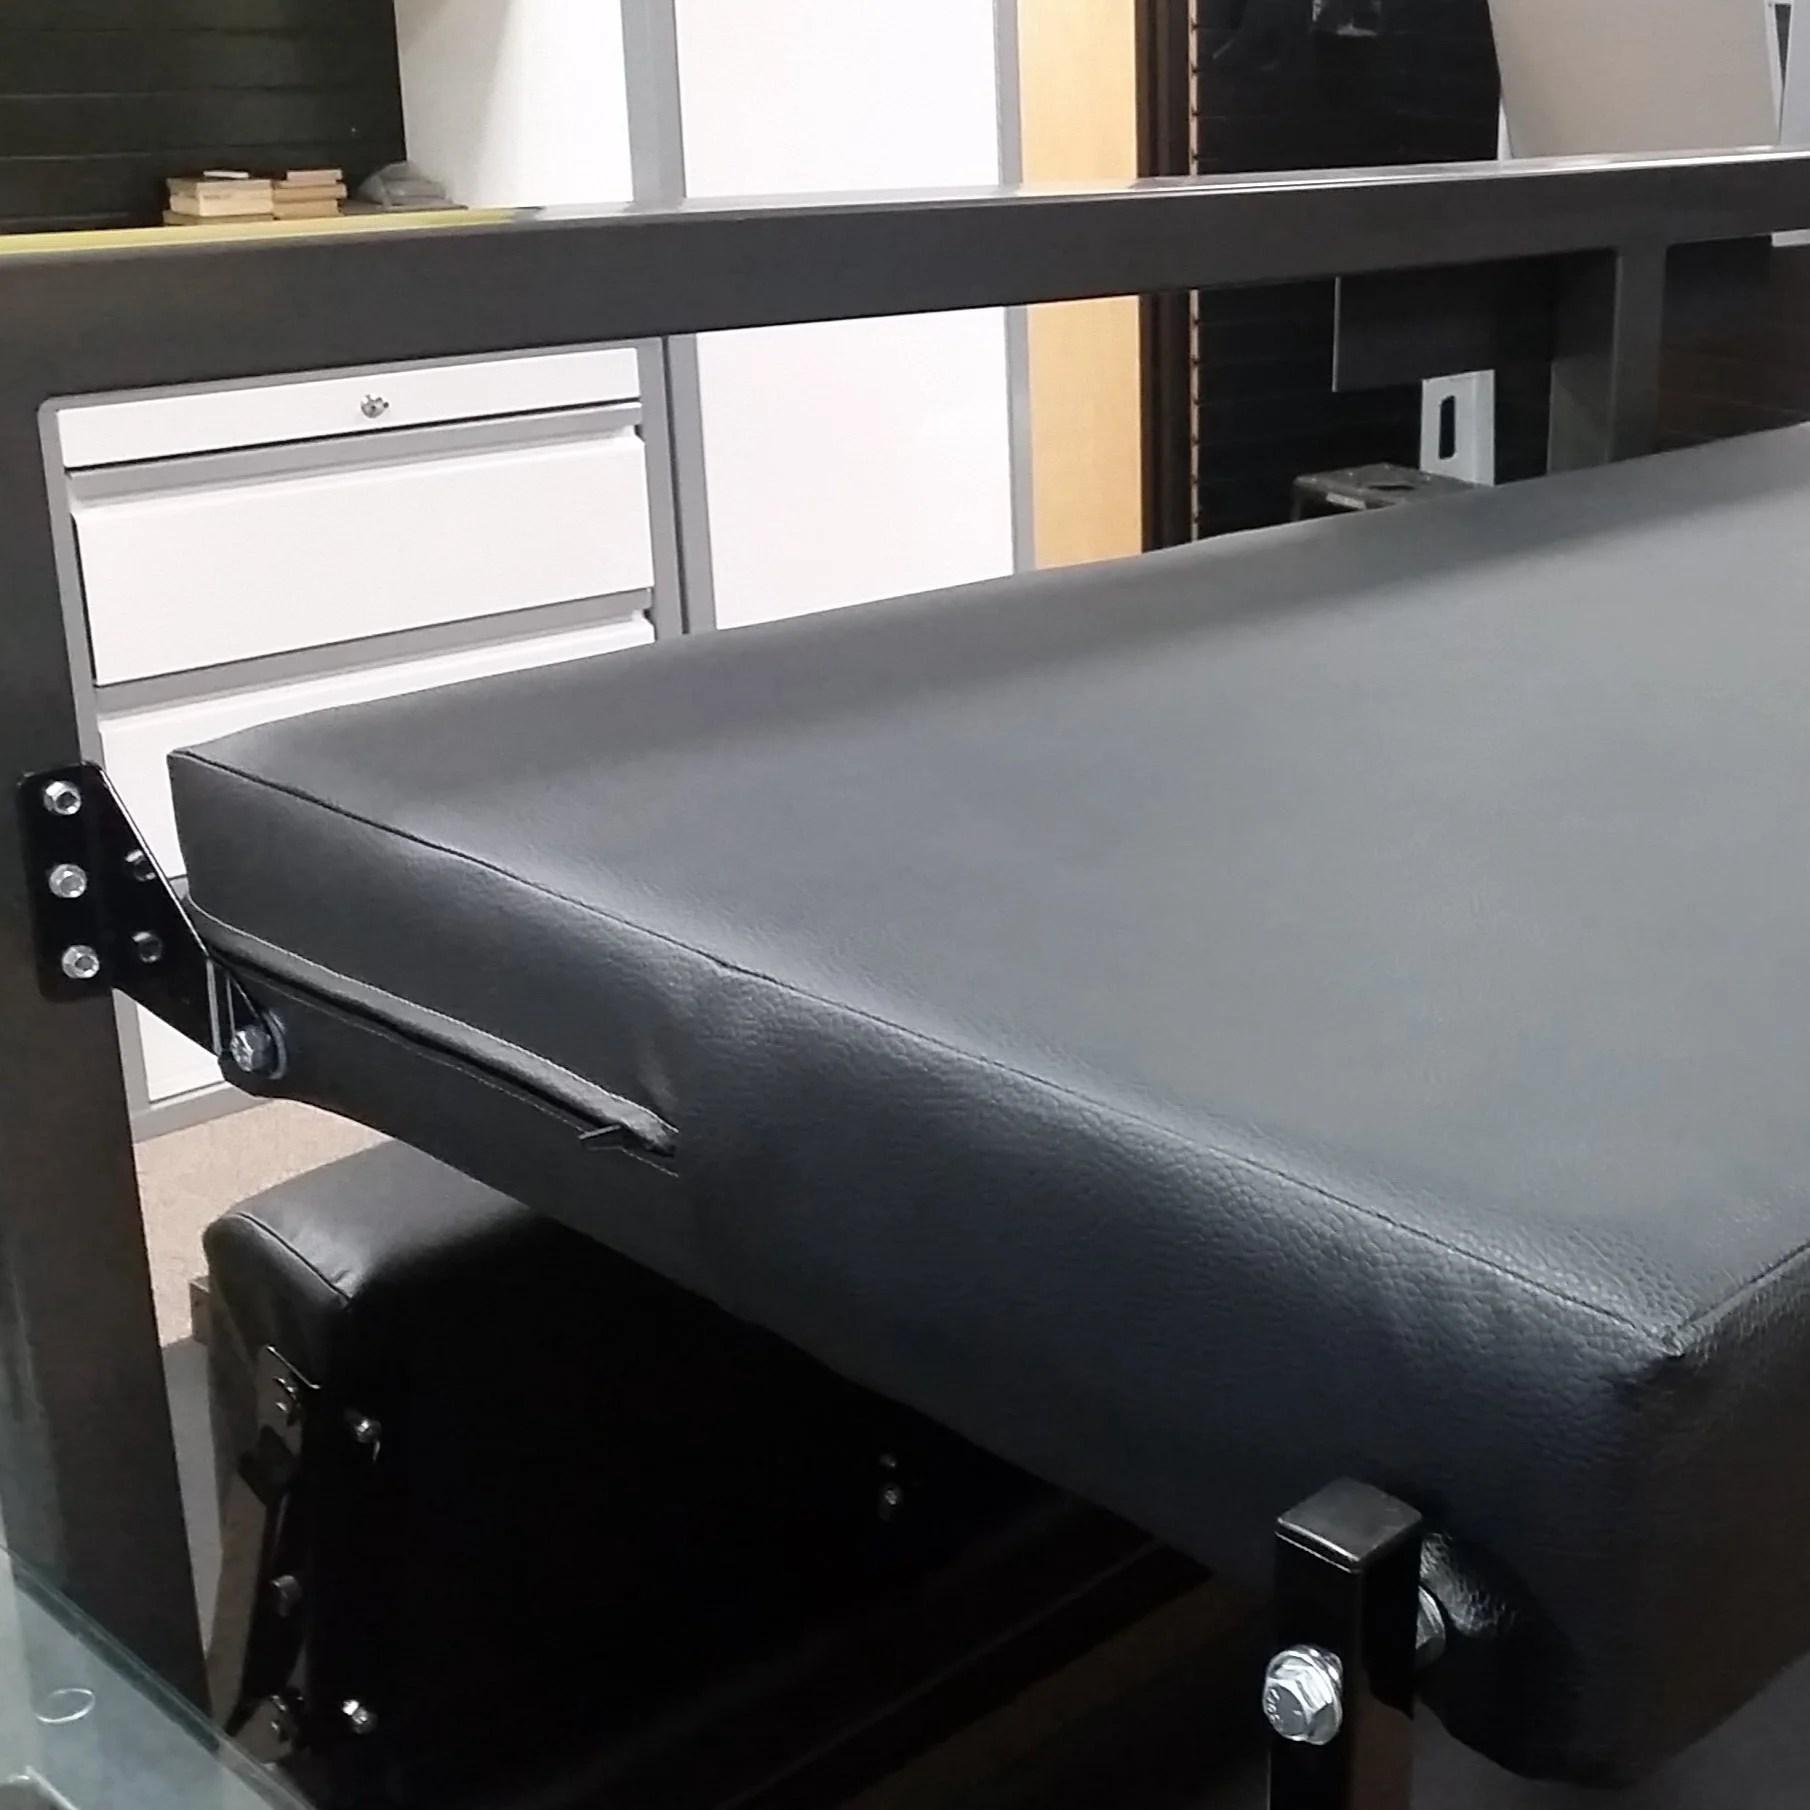 Folding Bunk Bed 76 Black Vinyl Rb Components